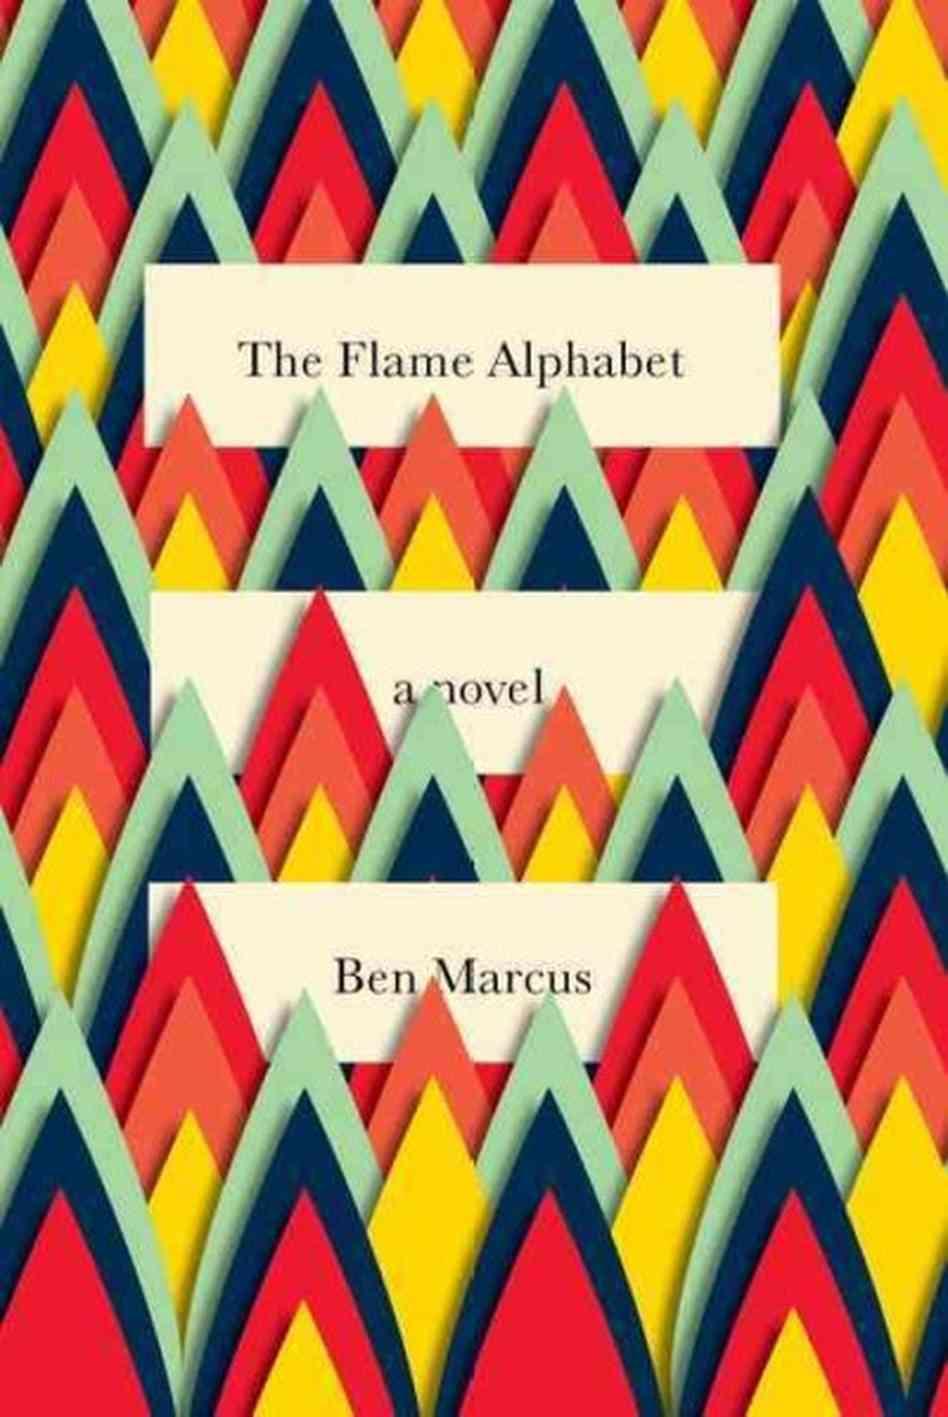 Ben Marcus: The Flame Alphabet